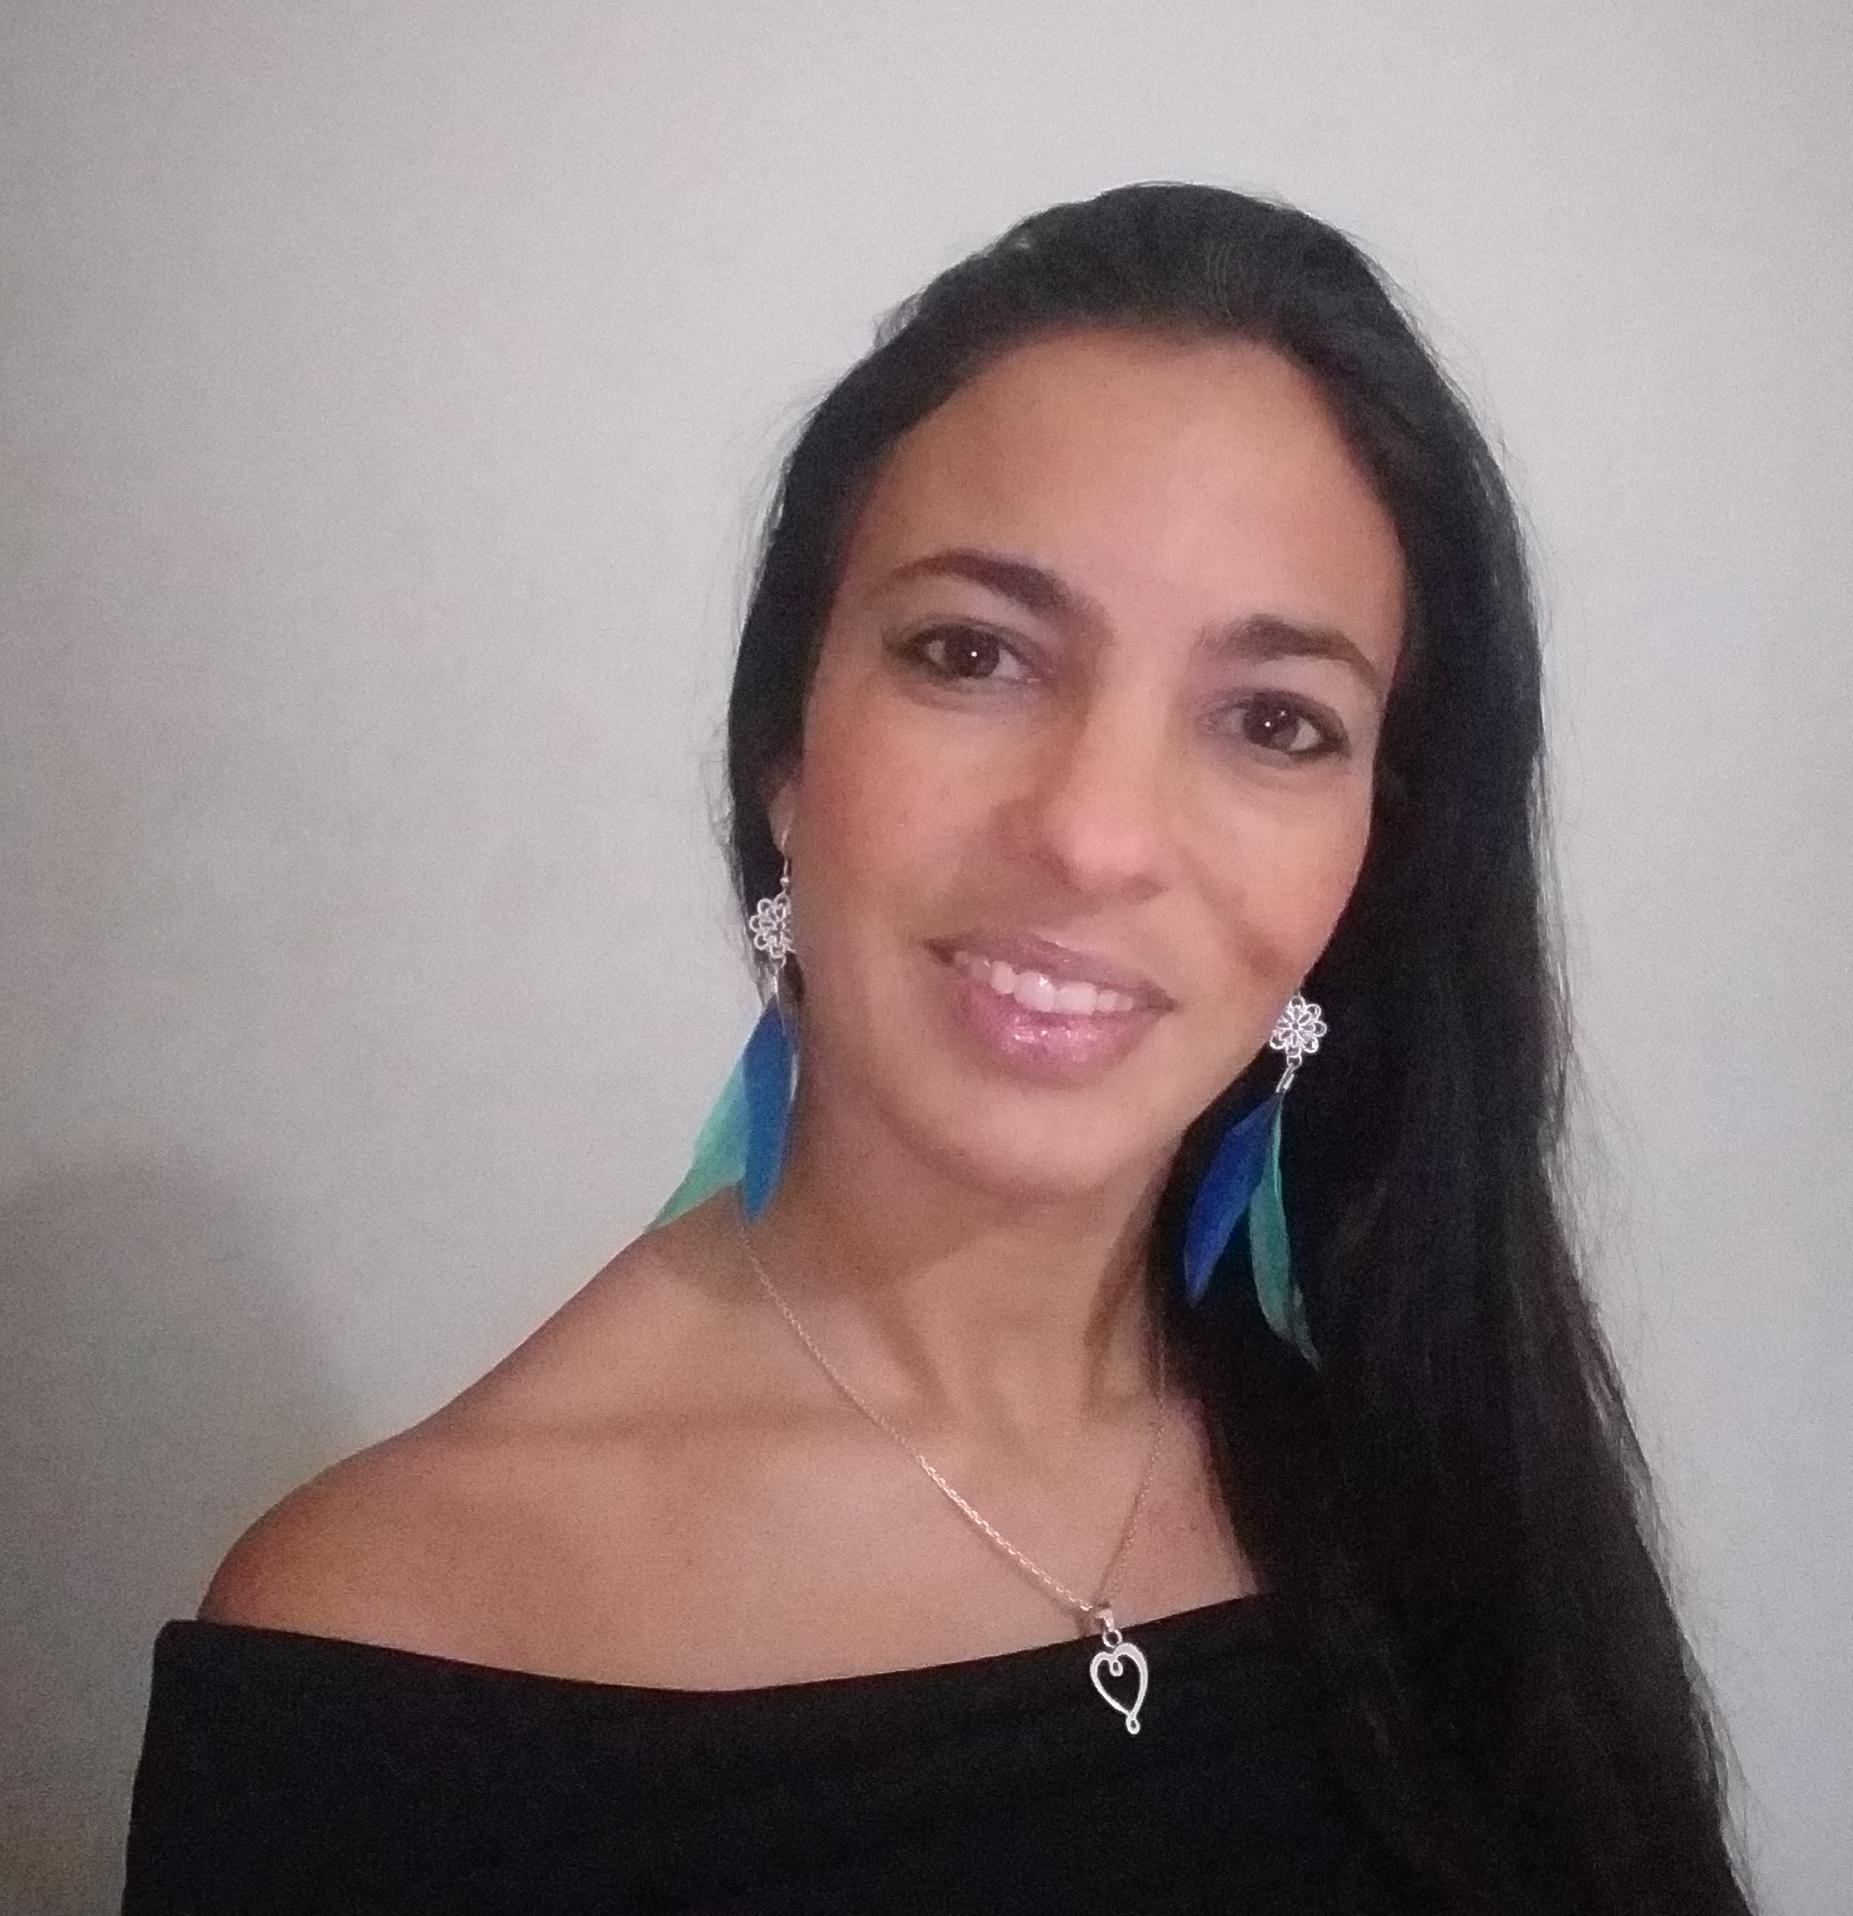 Verónica Bartolommei